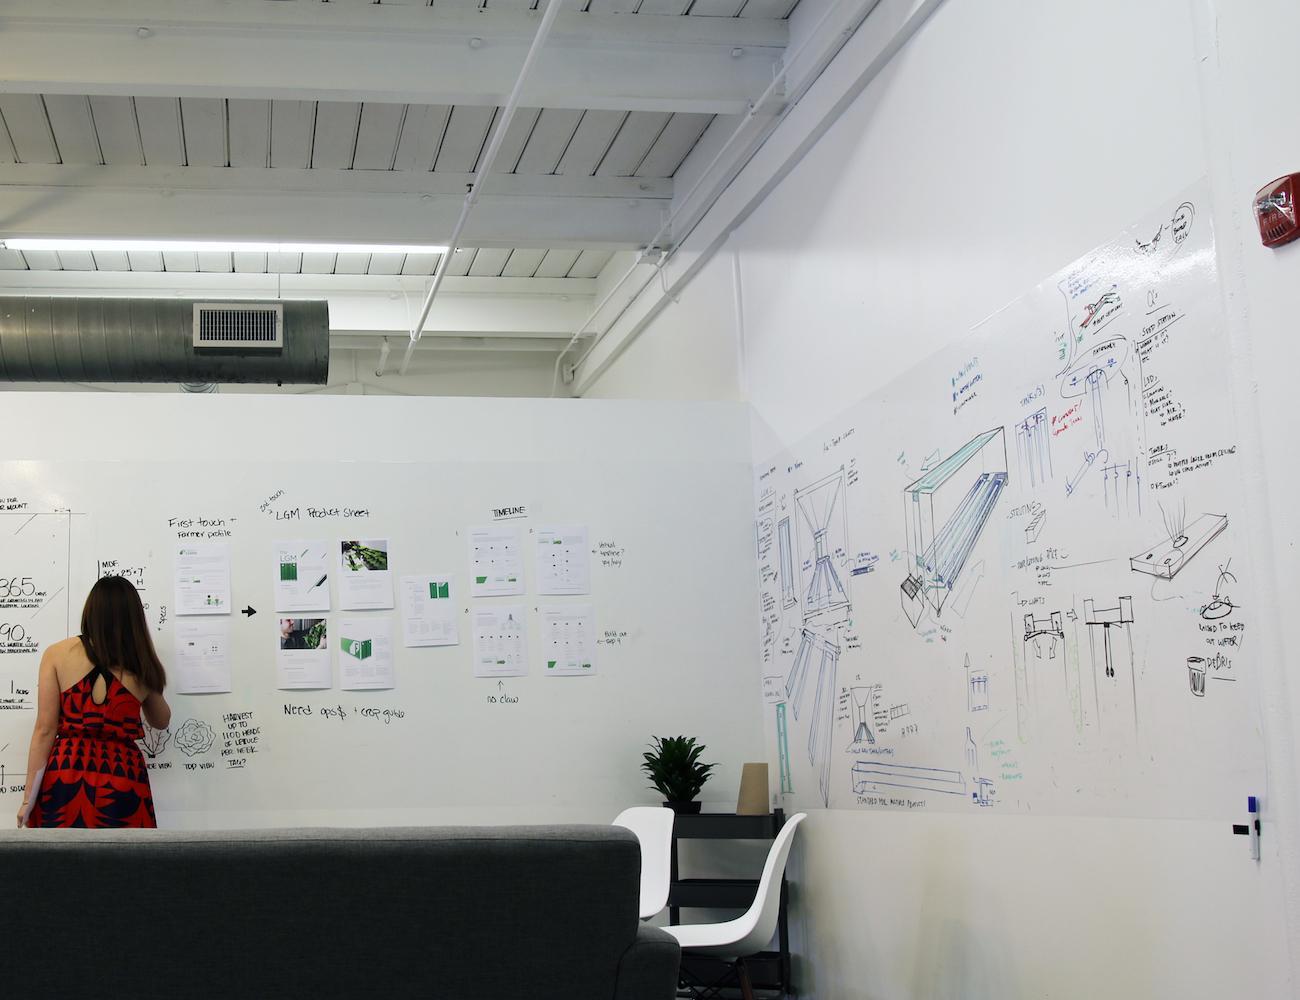 Think Board Xl Reusable Writing Surface 187 Gadget Flow